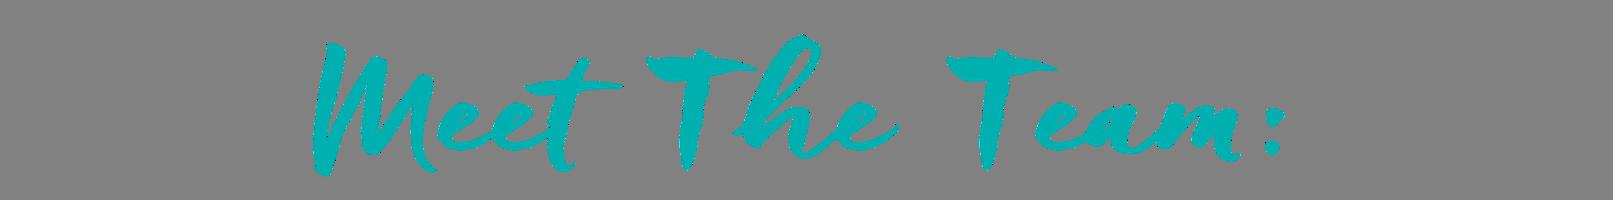 Mental Health Nursing Society | The Students' Union at UWE